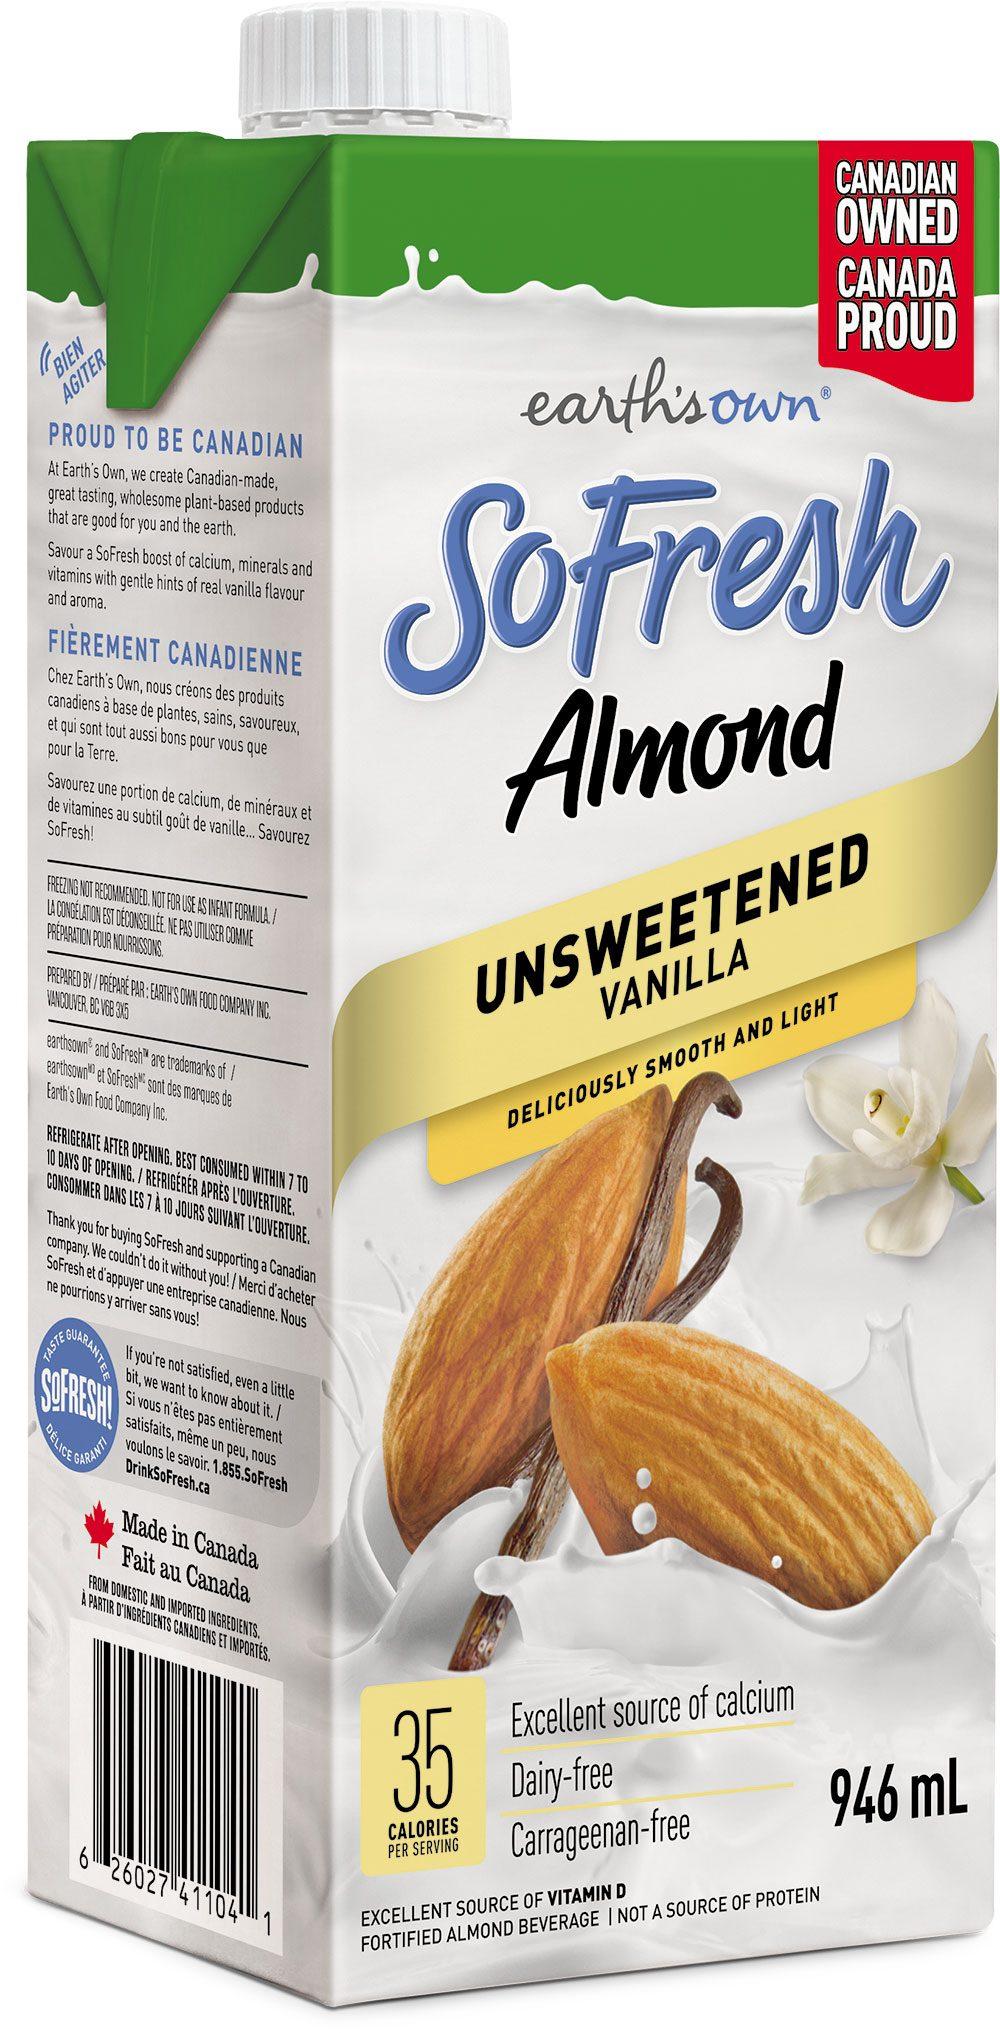 SoFresh Almond – Unsweetened Vanilla 946ml